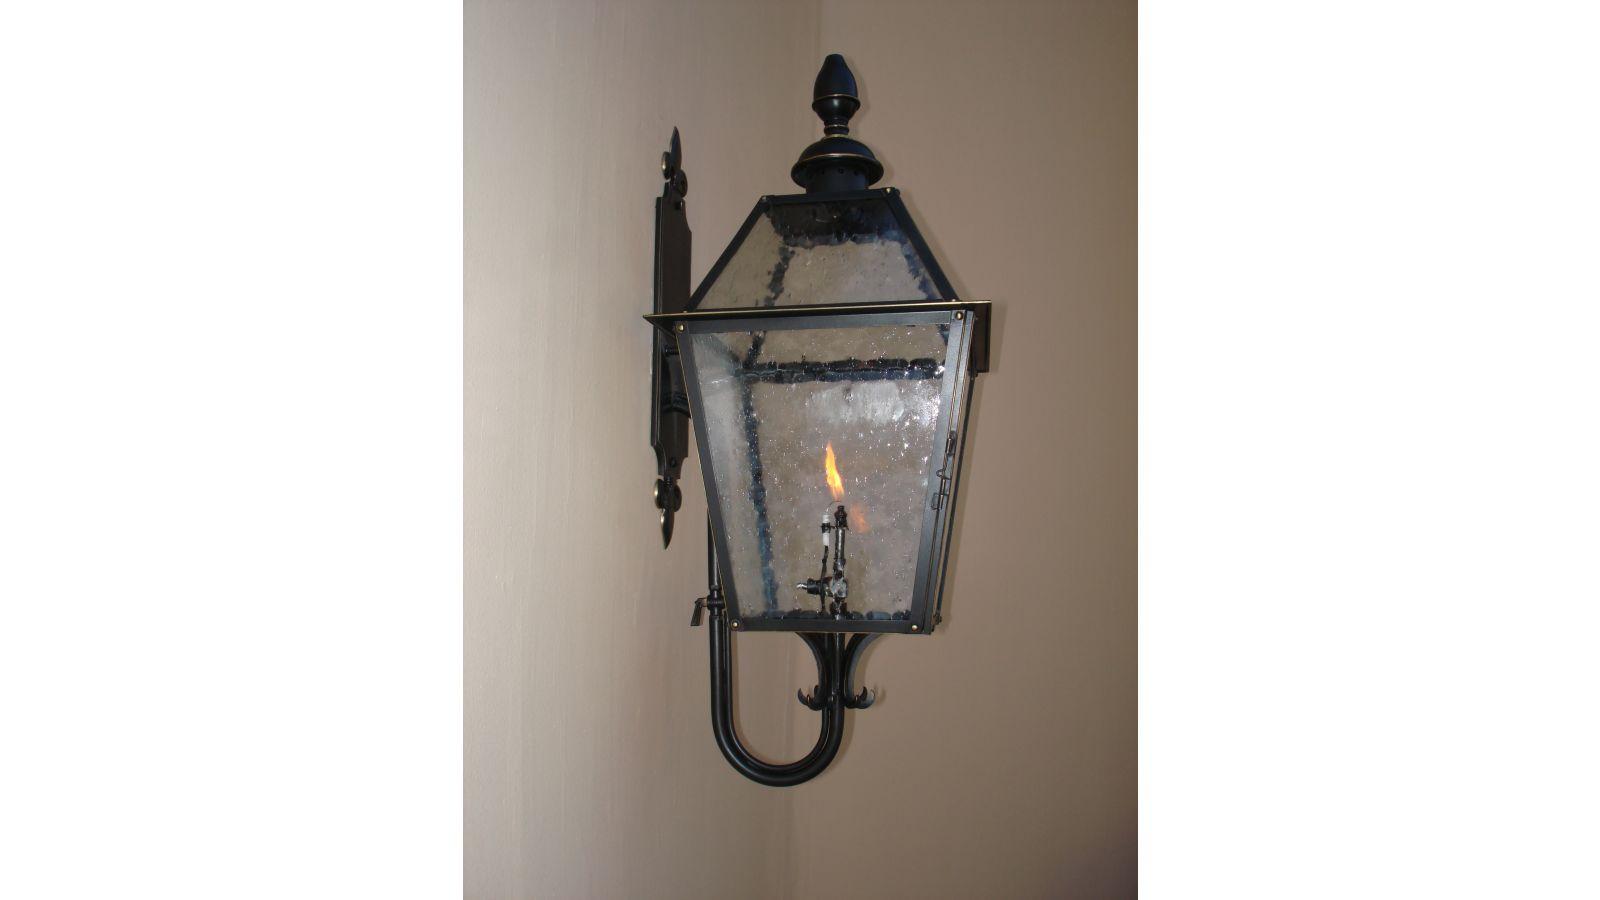 Custom wall mounted gas lantern